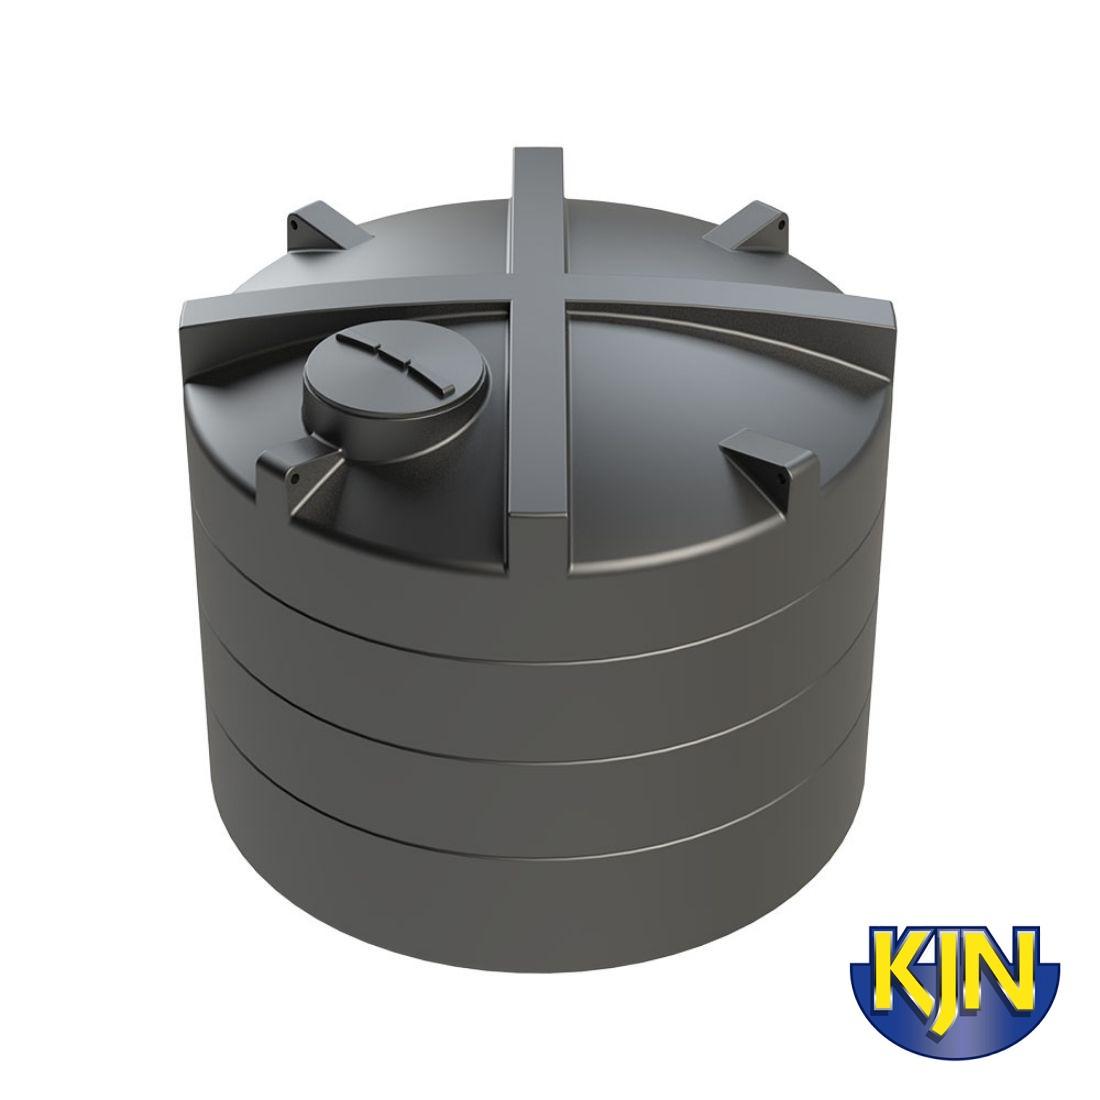 Enduramaxx 8,500 Litre Vertical Potable WRAS Water Storage Tank